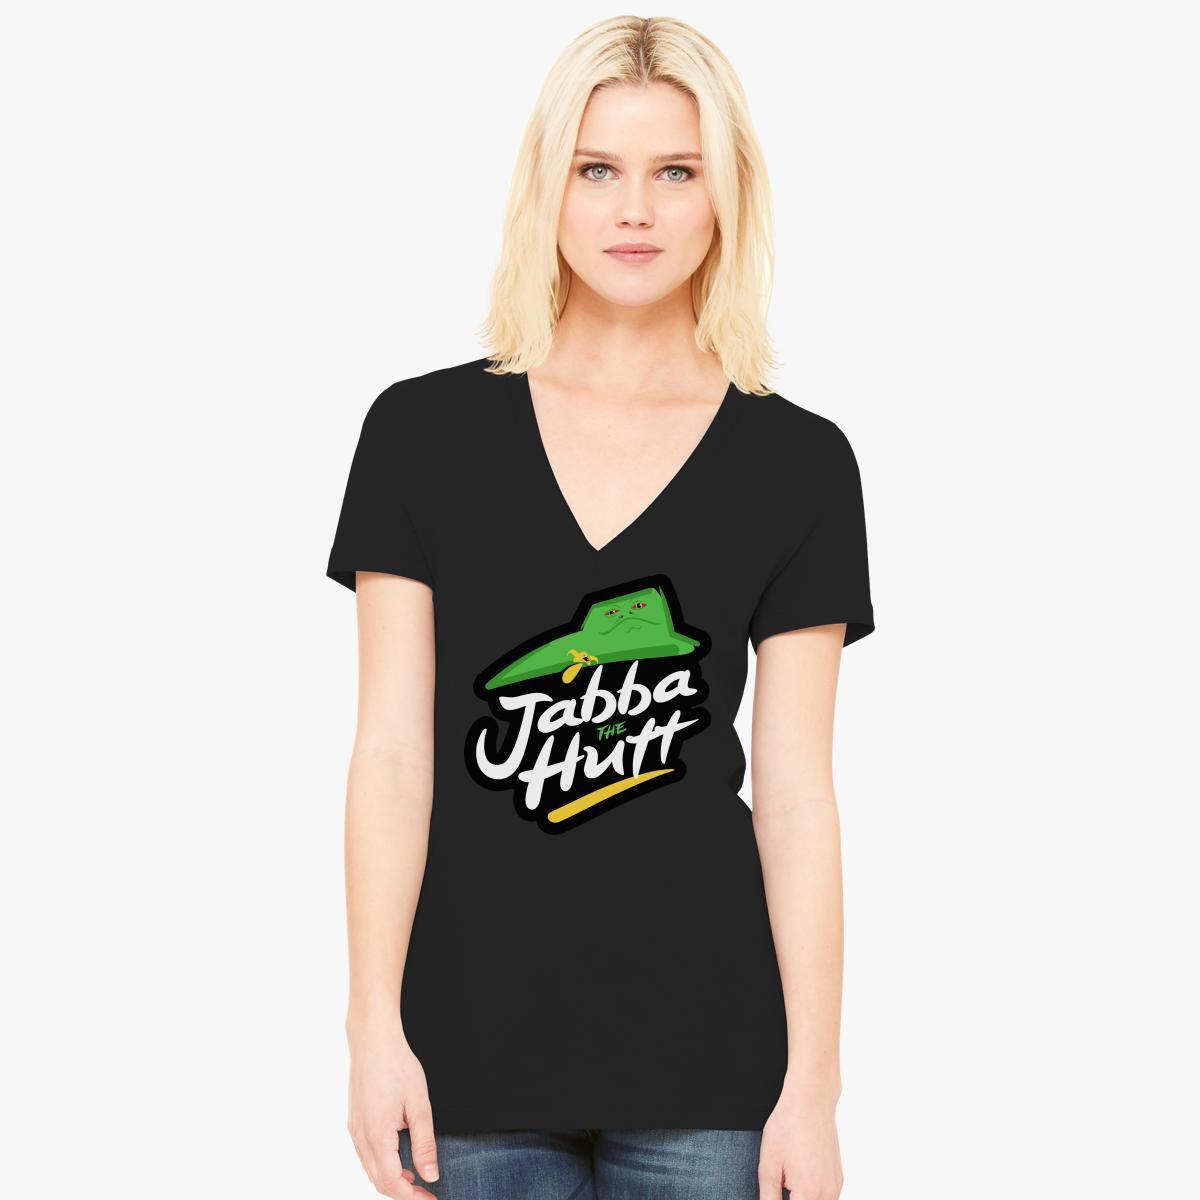 Jabba The Hutt Women's V-Neck T-shirt